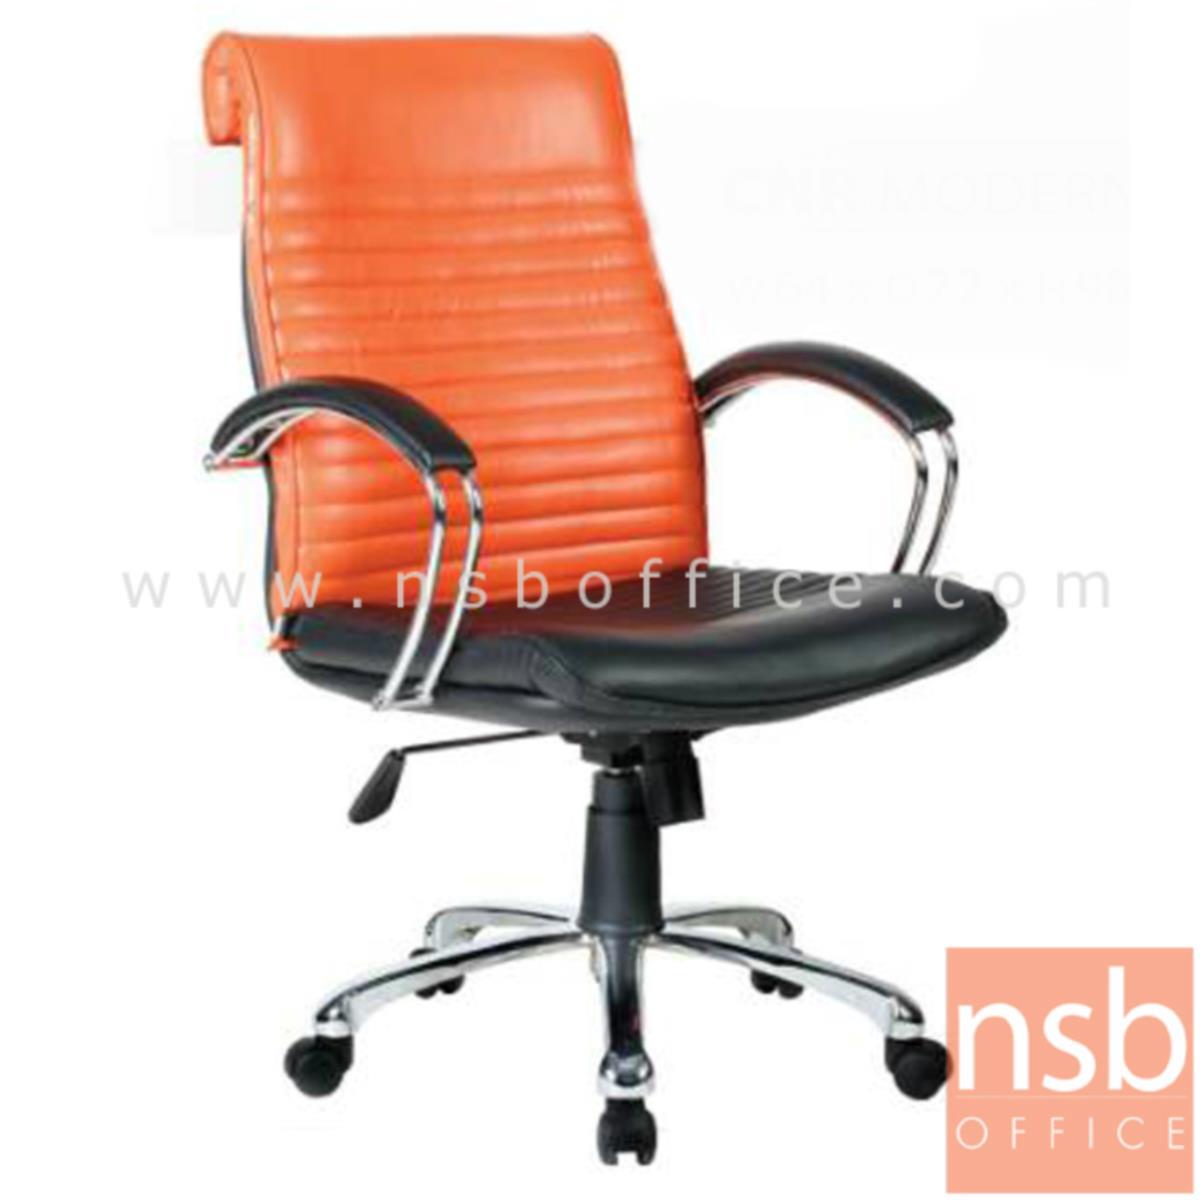 B26A039:เก้าอี้สำนักงาน รุ่น Rogers (โรเจอส์)  โช๊คแก๊ส มีก้อนโยก ขาเหล็กชุบโครเมี่ยม